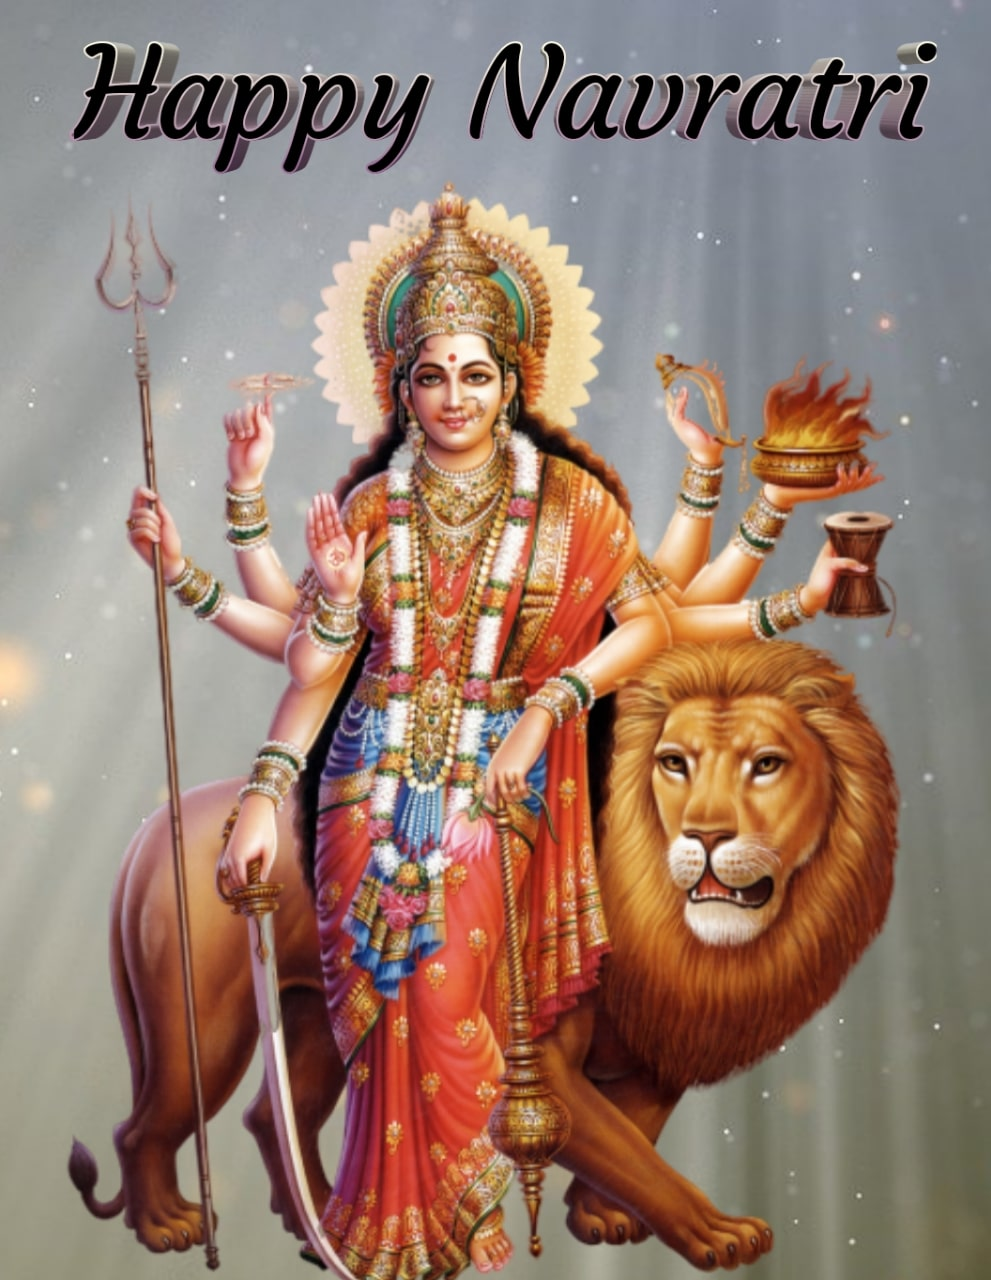 best images of Kali maa durga